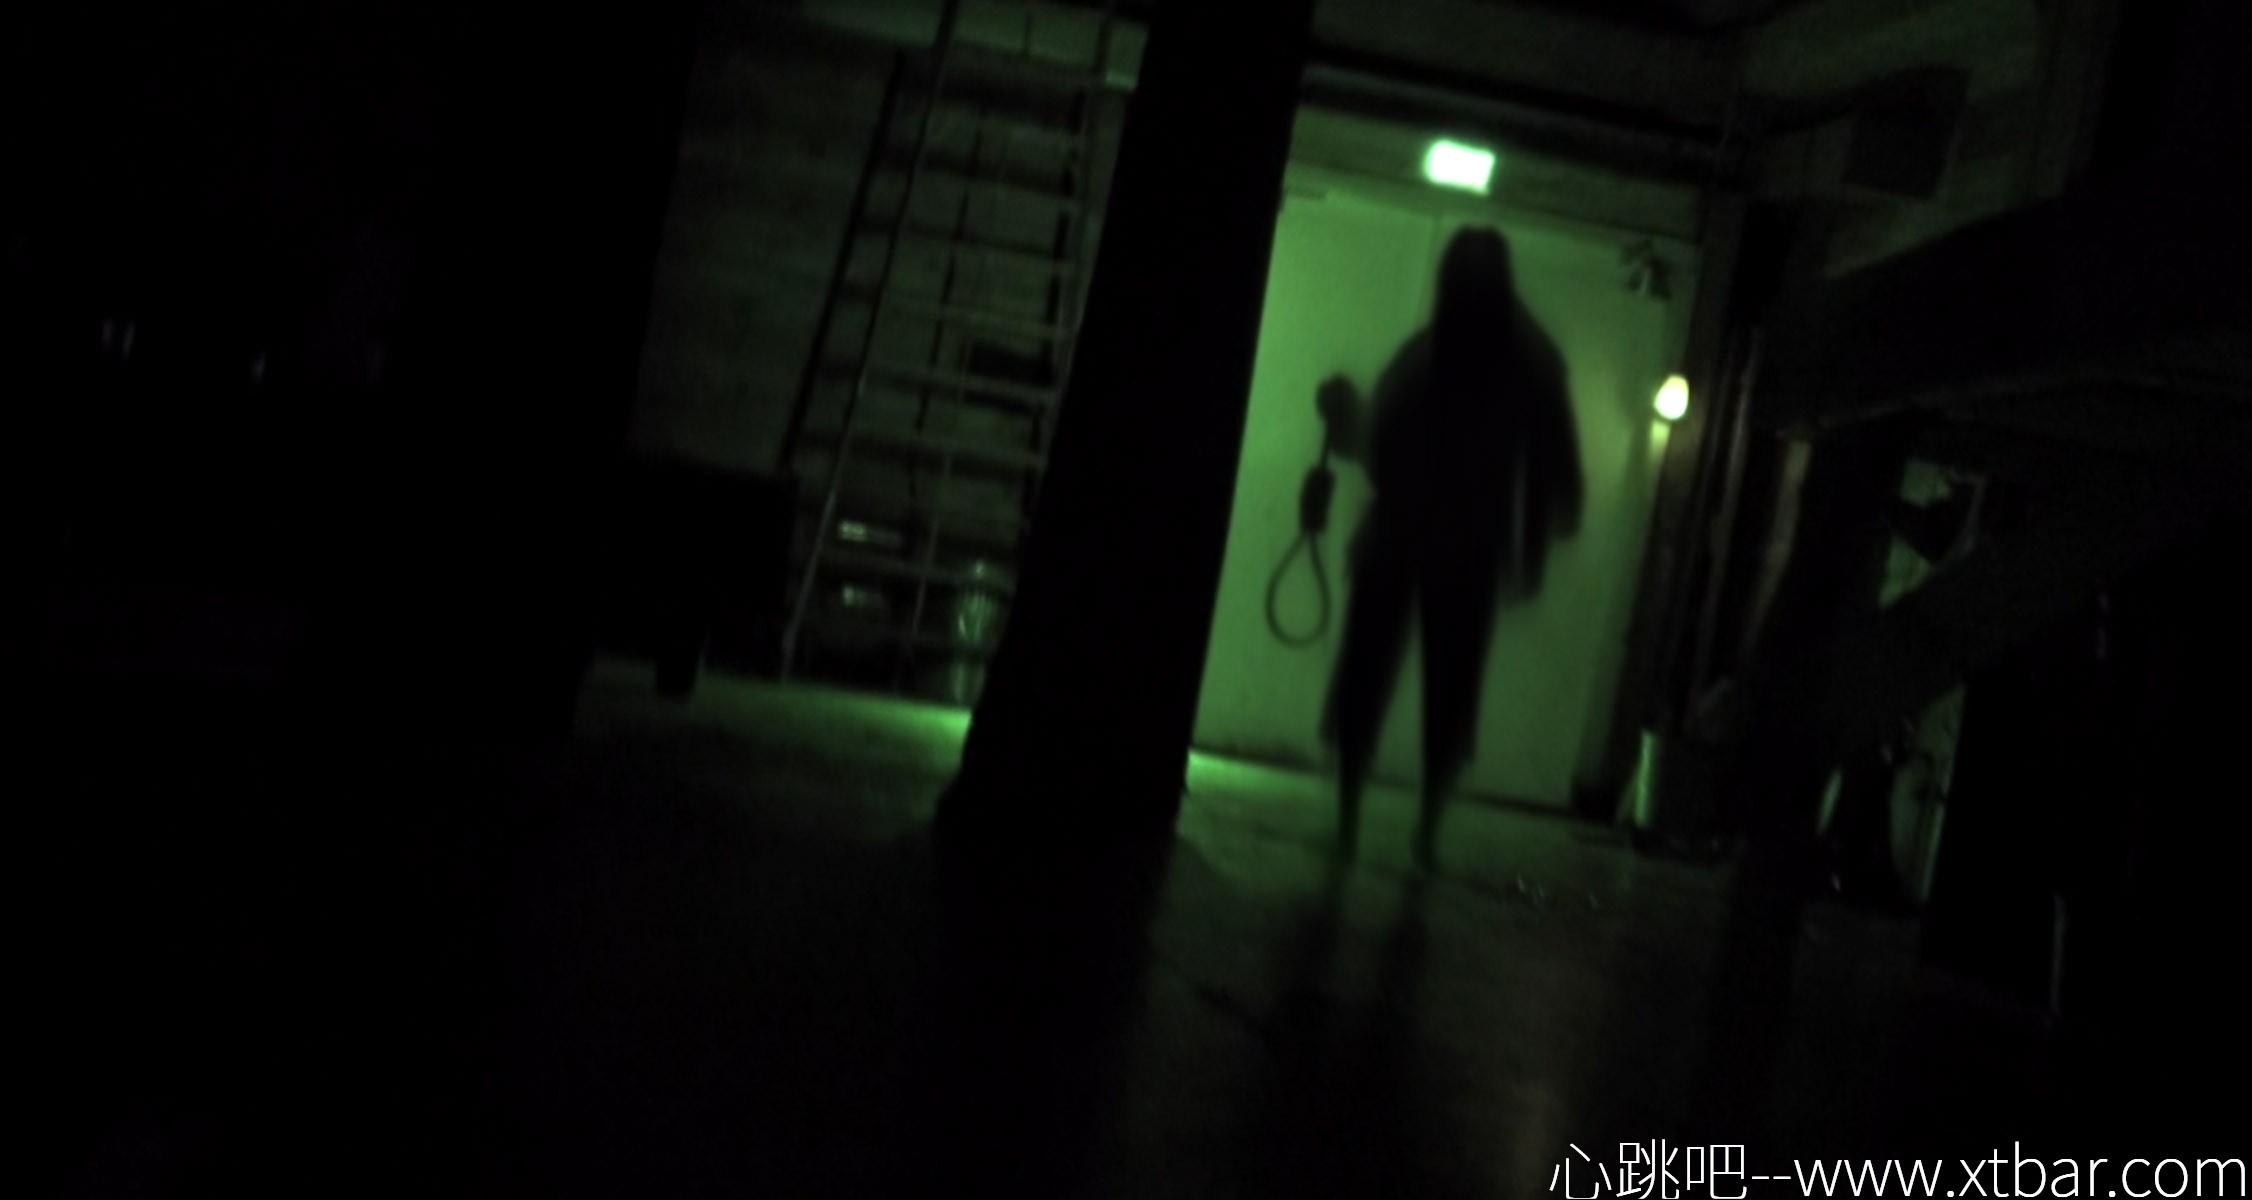 0085j6oIly1ghaytktpa3j31qk0xcwhb - 周六恐怖片推荐:《绞刑架》,认真演戏就会死!